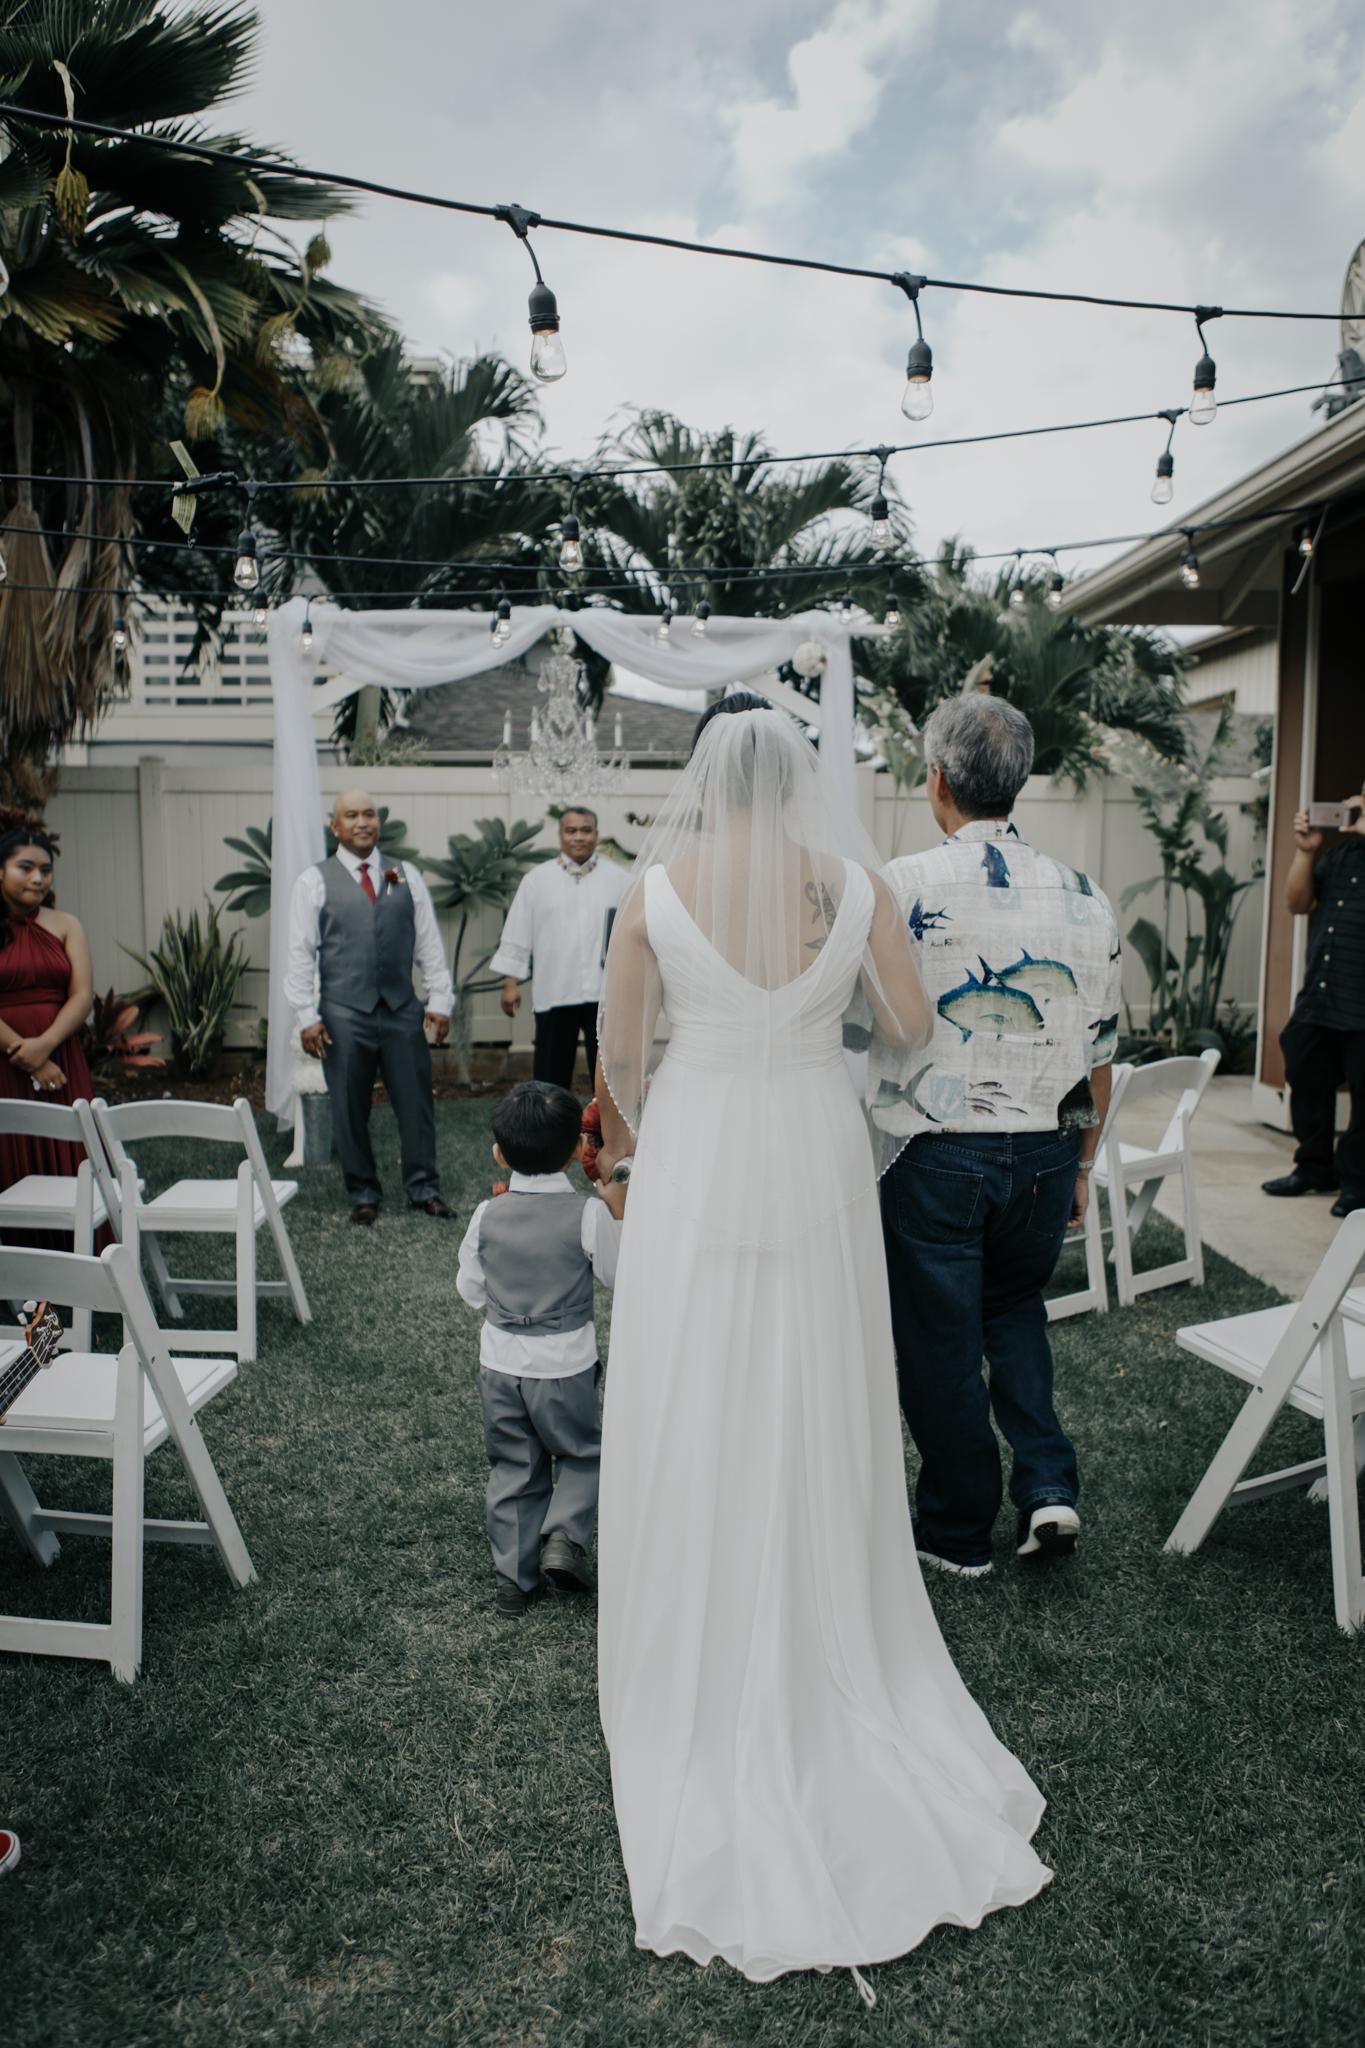 Backyard wedding in Ewa Beach